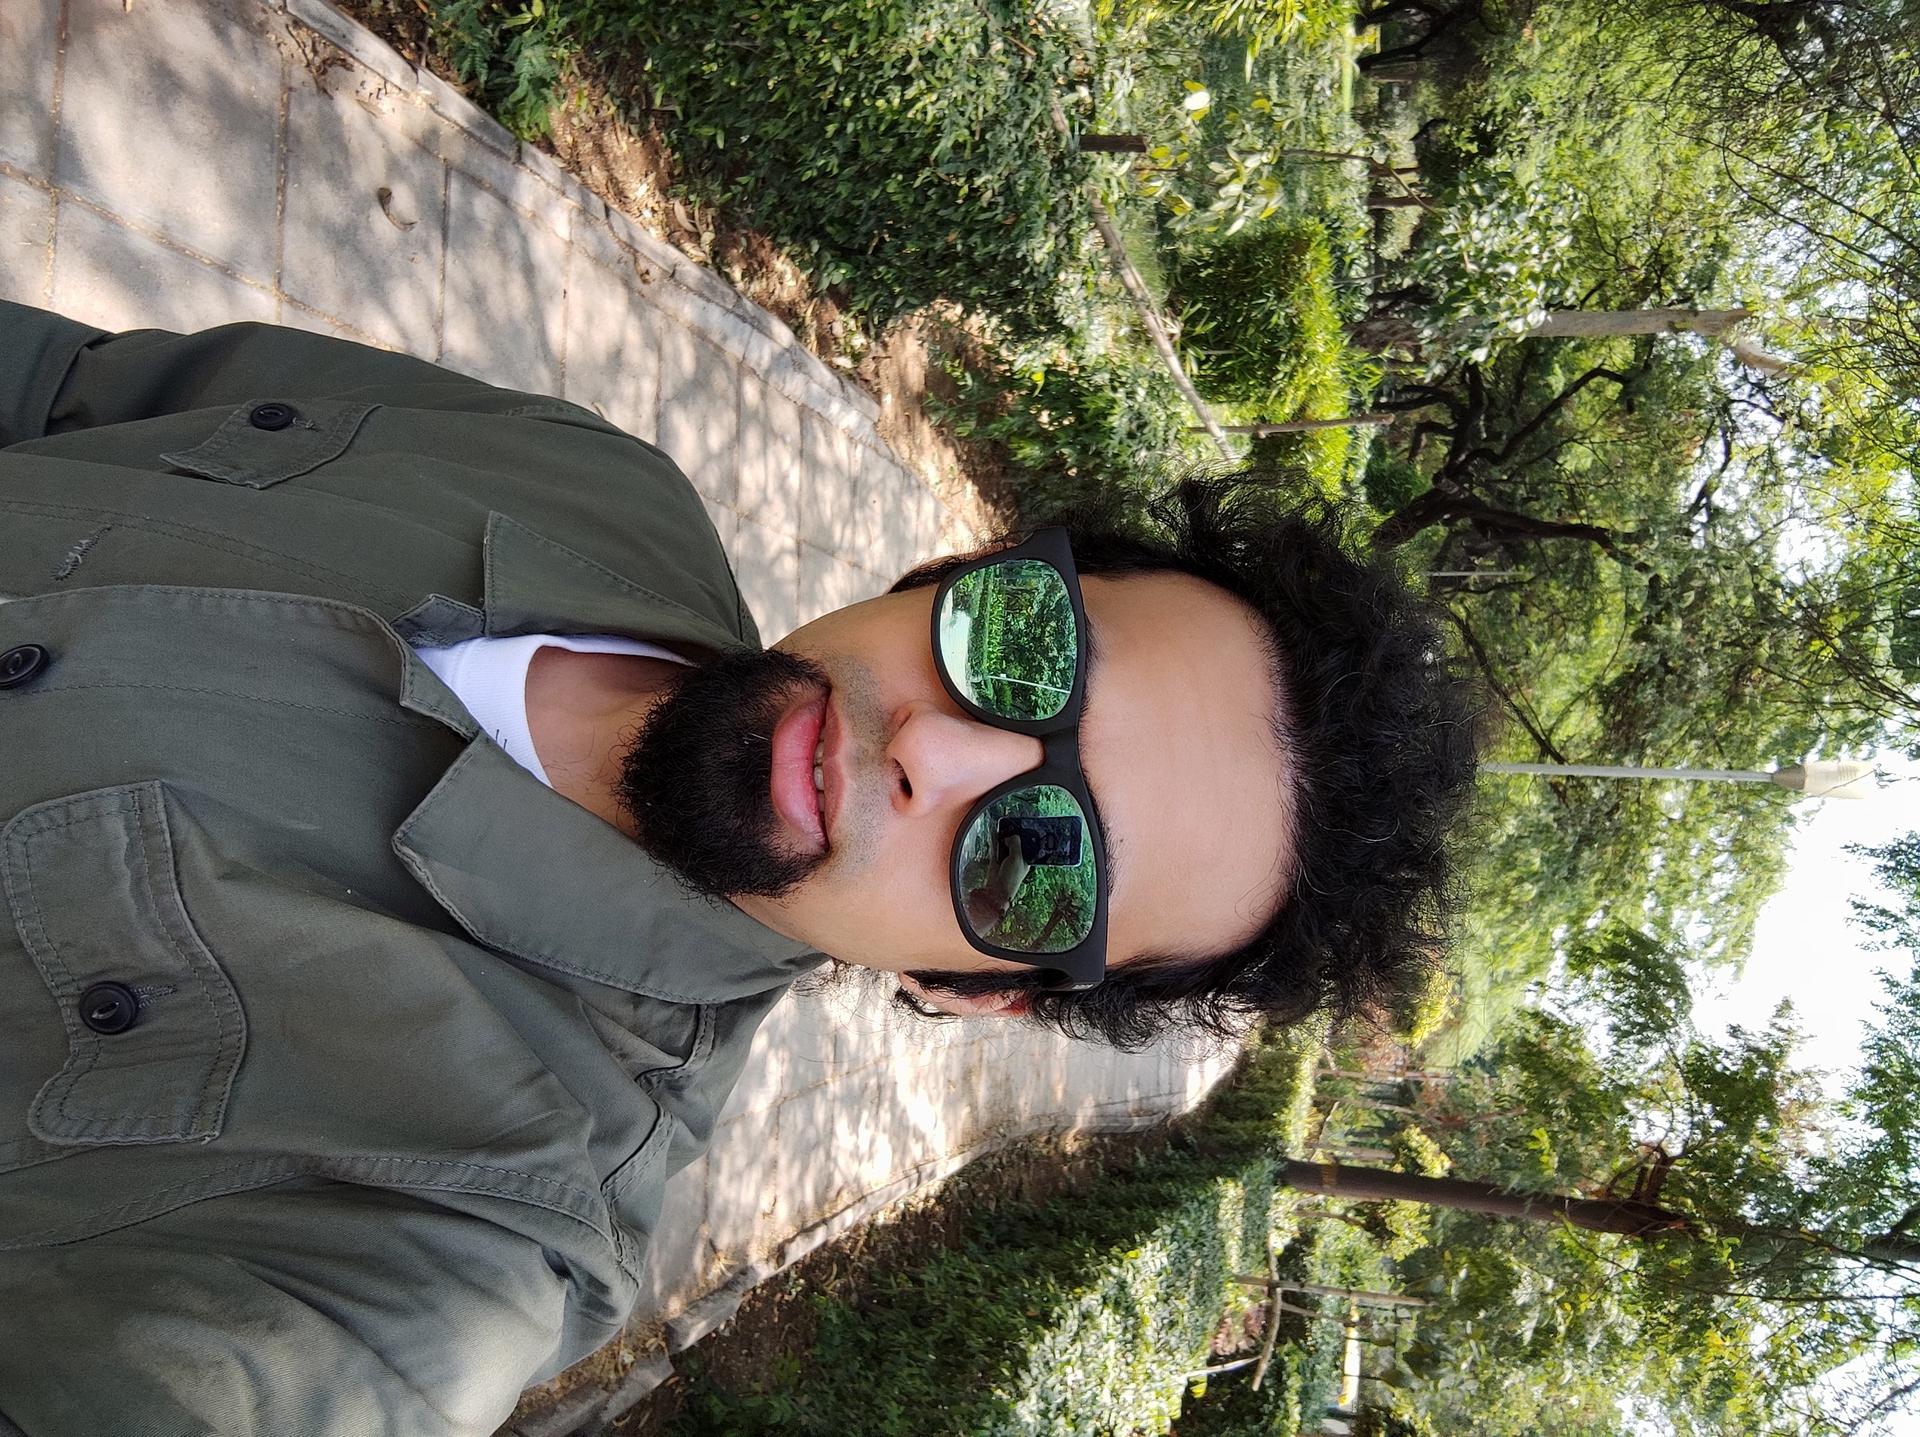 Mi 10 selfie camera